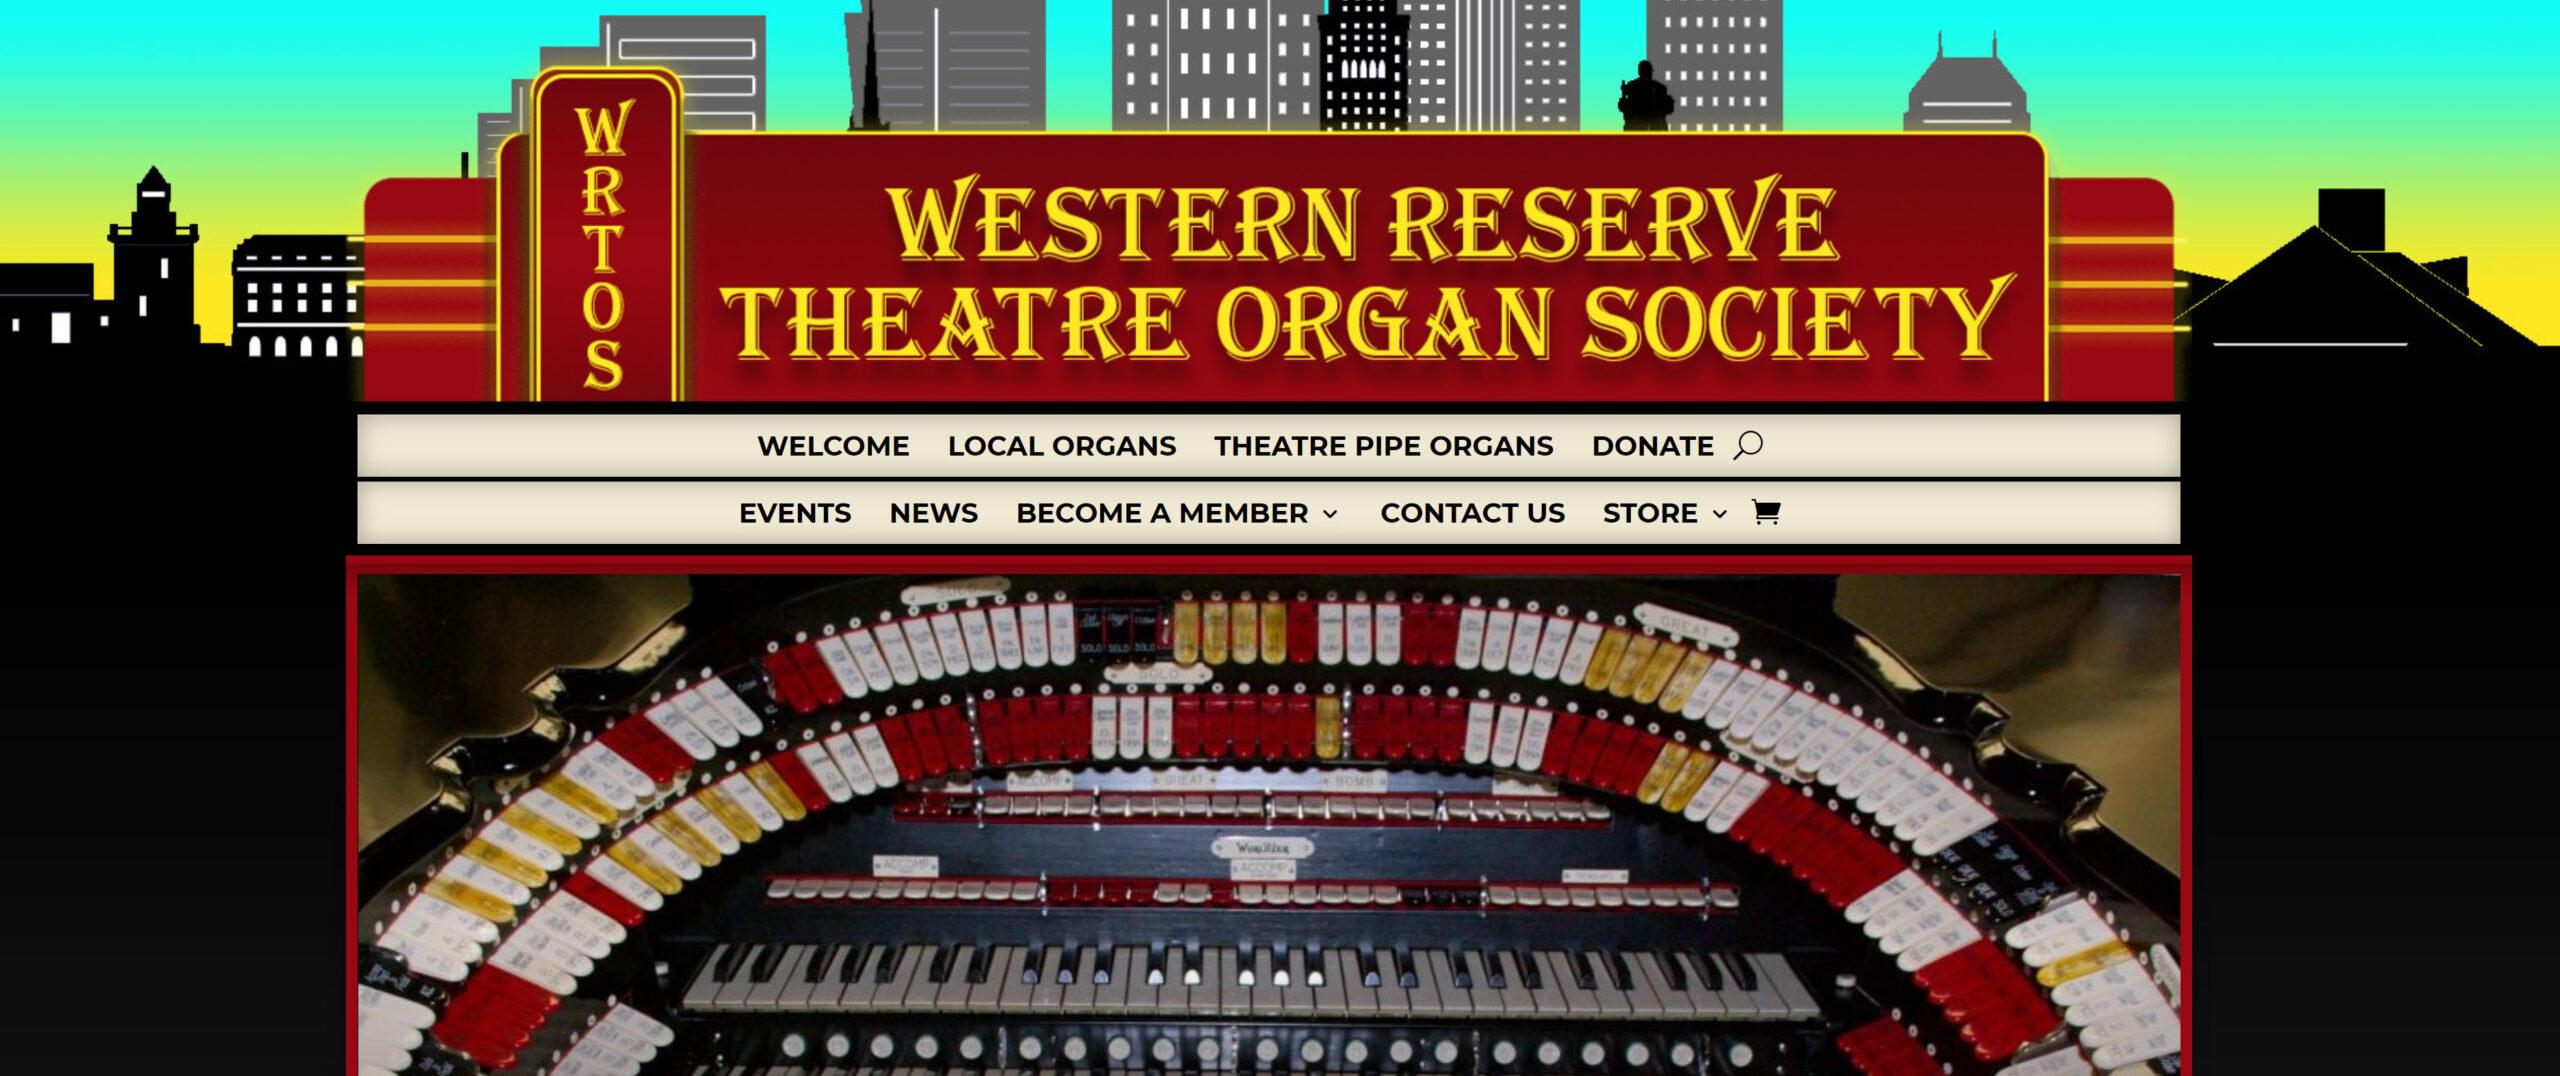 Western Reserve Theatre Organ Society Homepage